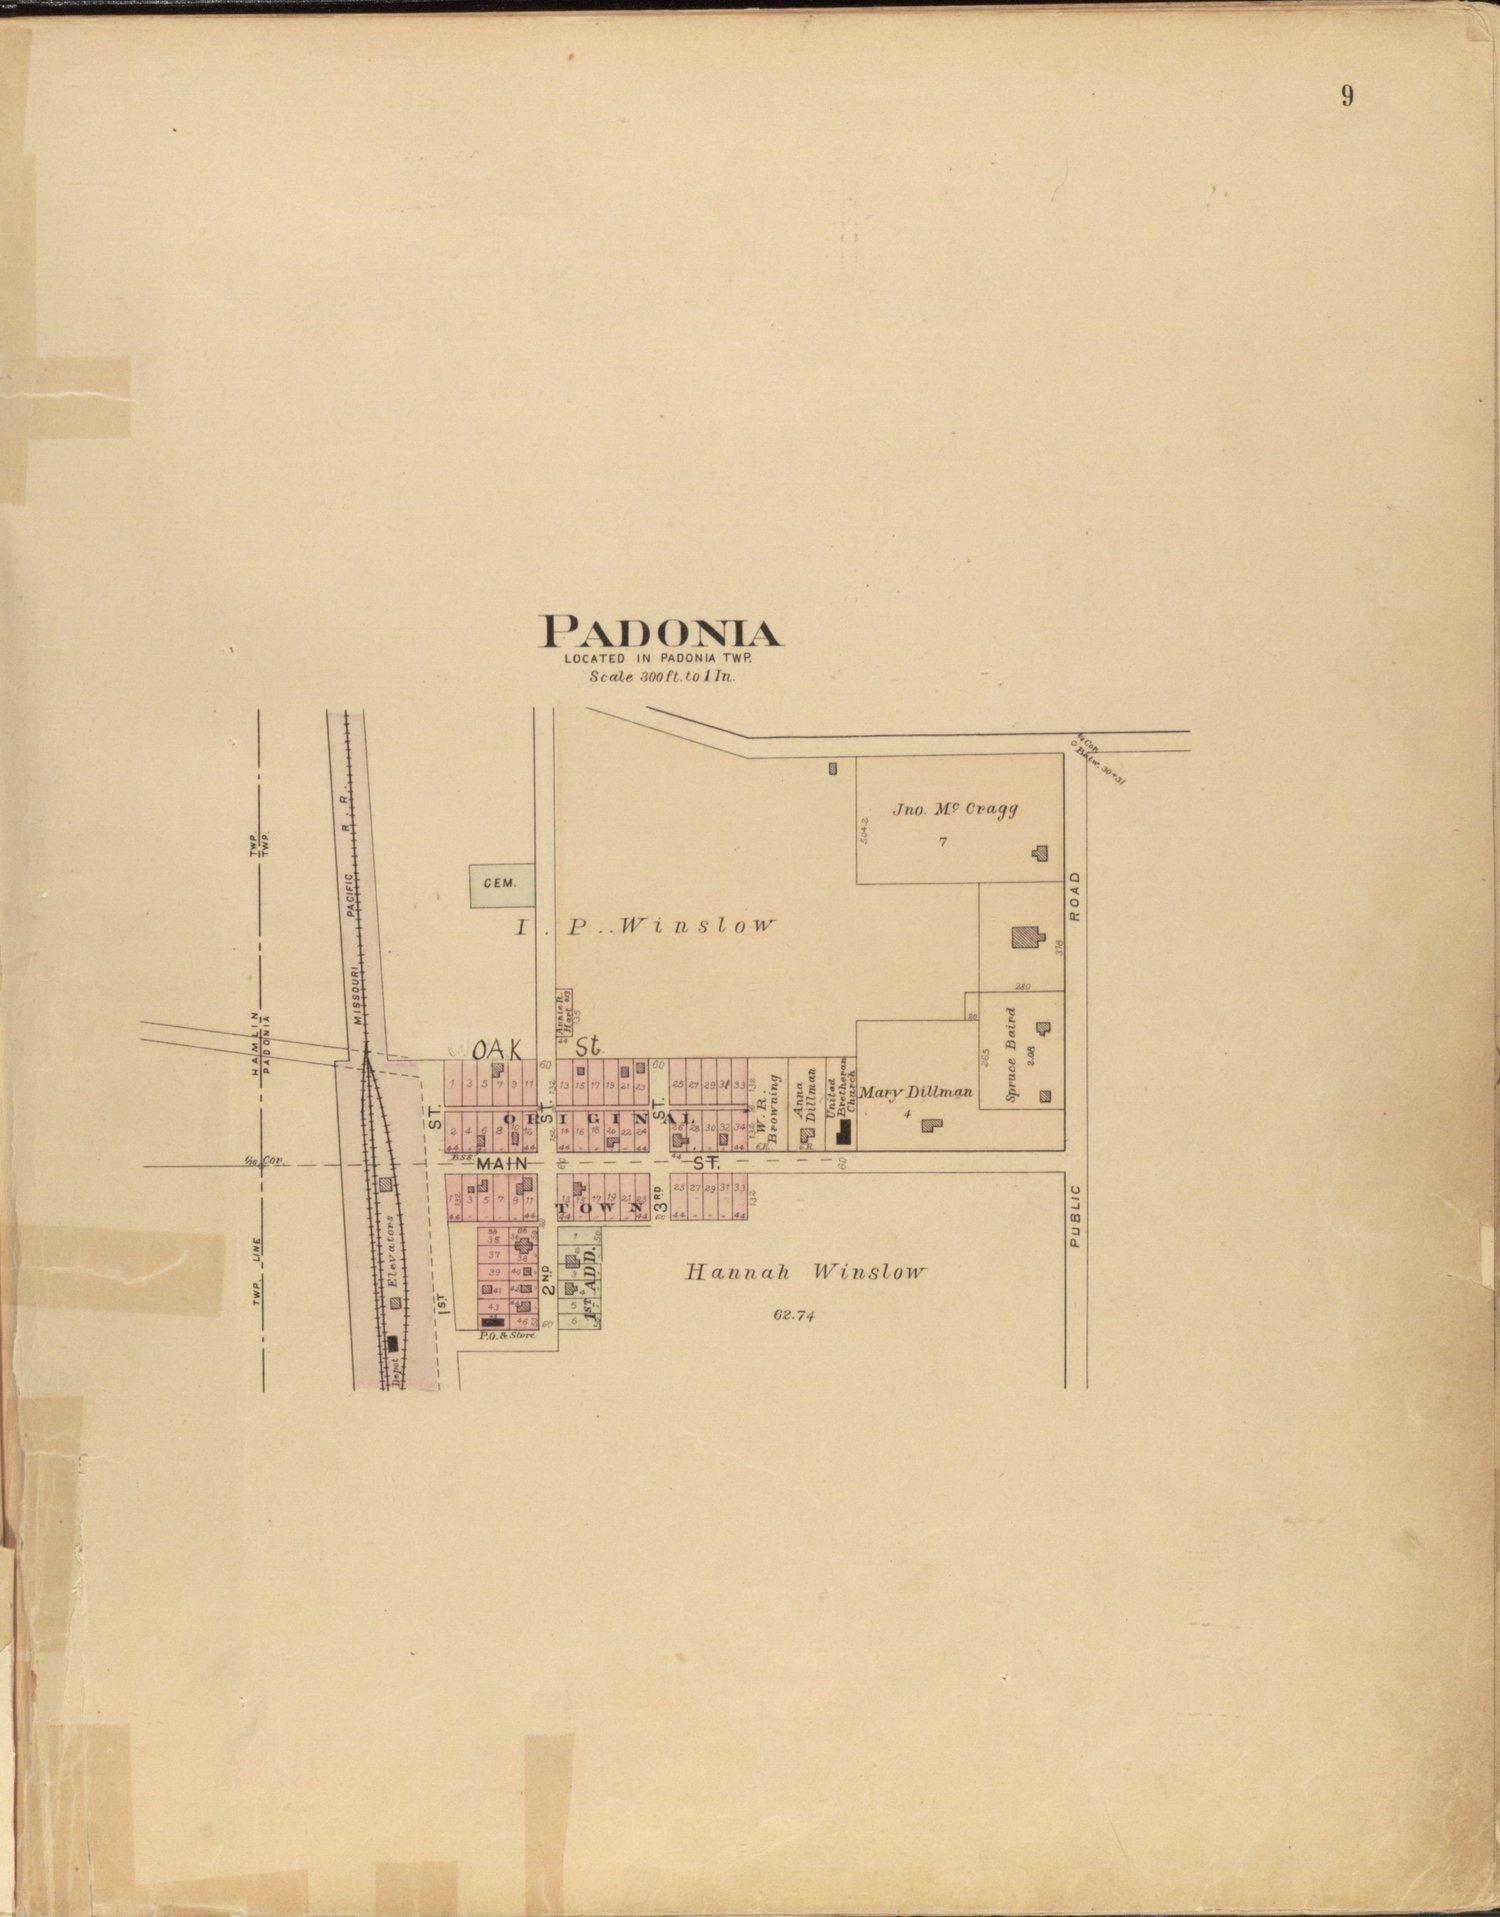 Plat book of Brown County, Kansas - 9